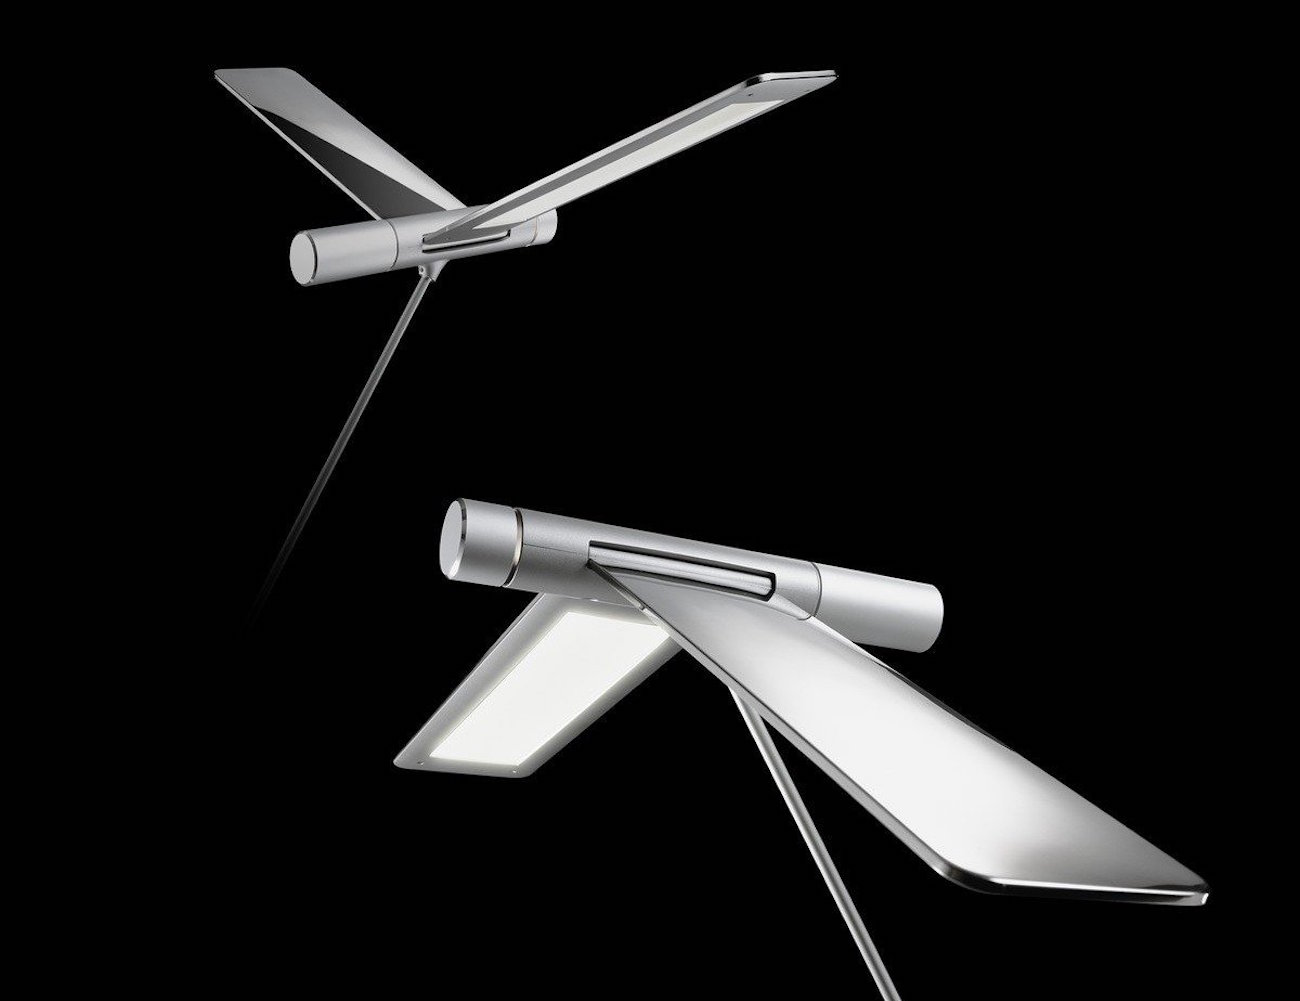 Seagull LED Desk Lamp by QisDesign